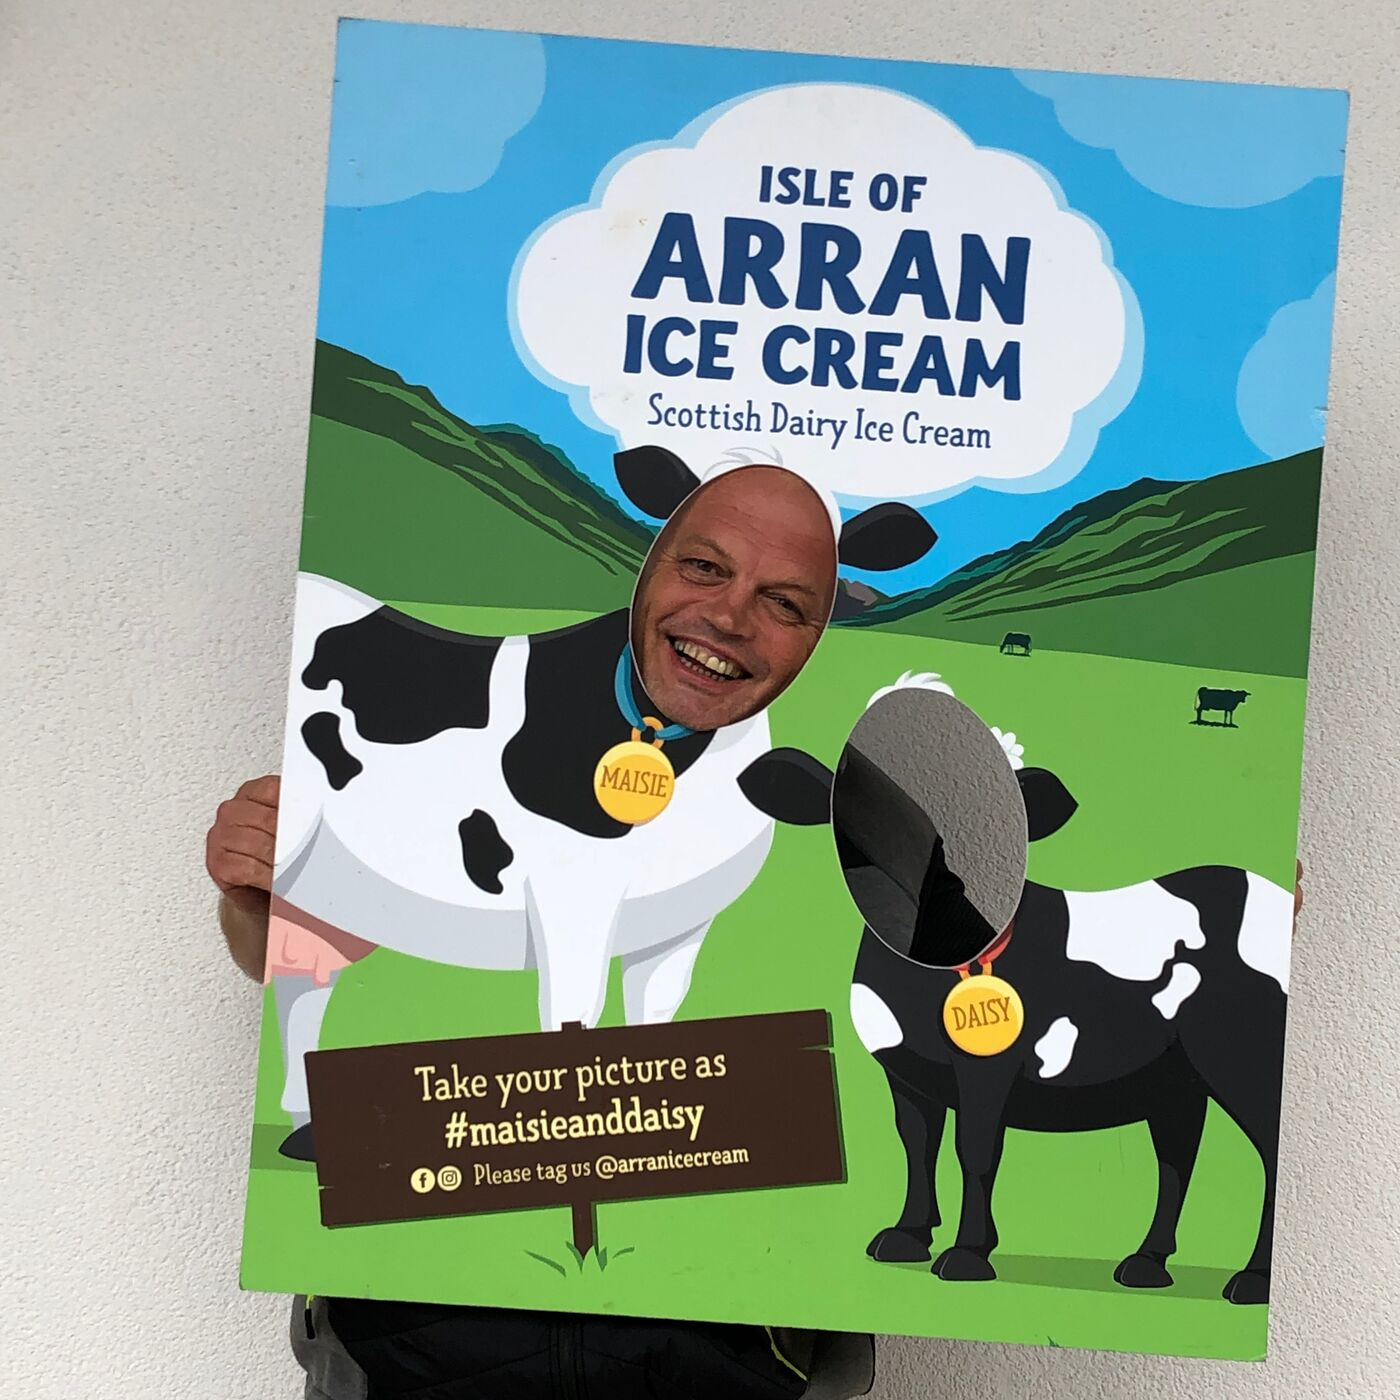 Episode 4 - Alastair Dobson of 'Taste of Arran'